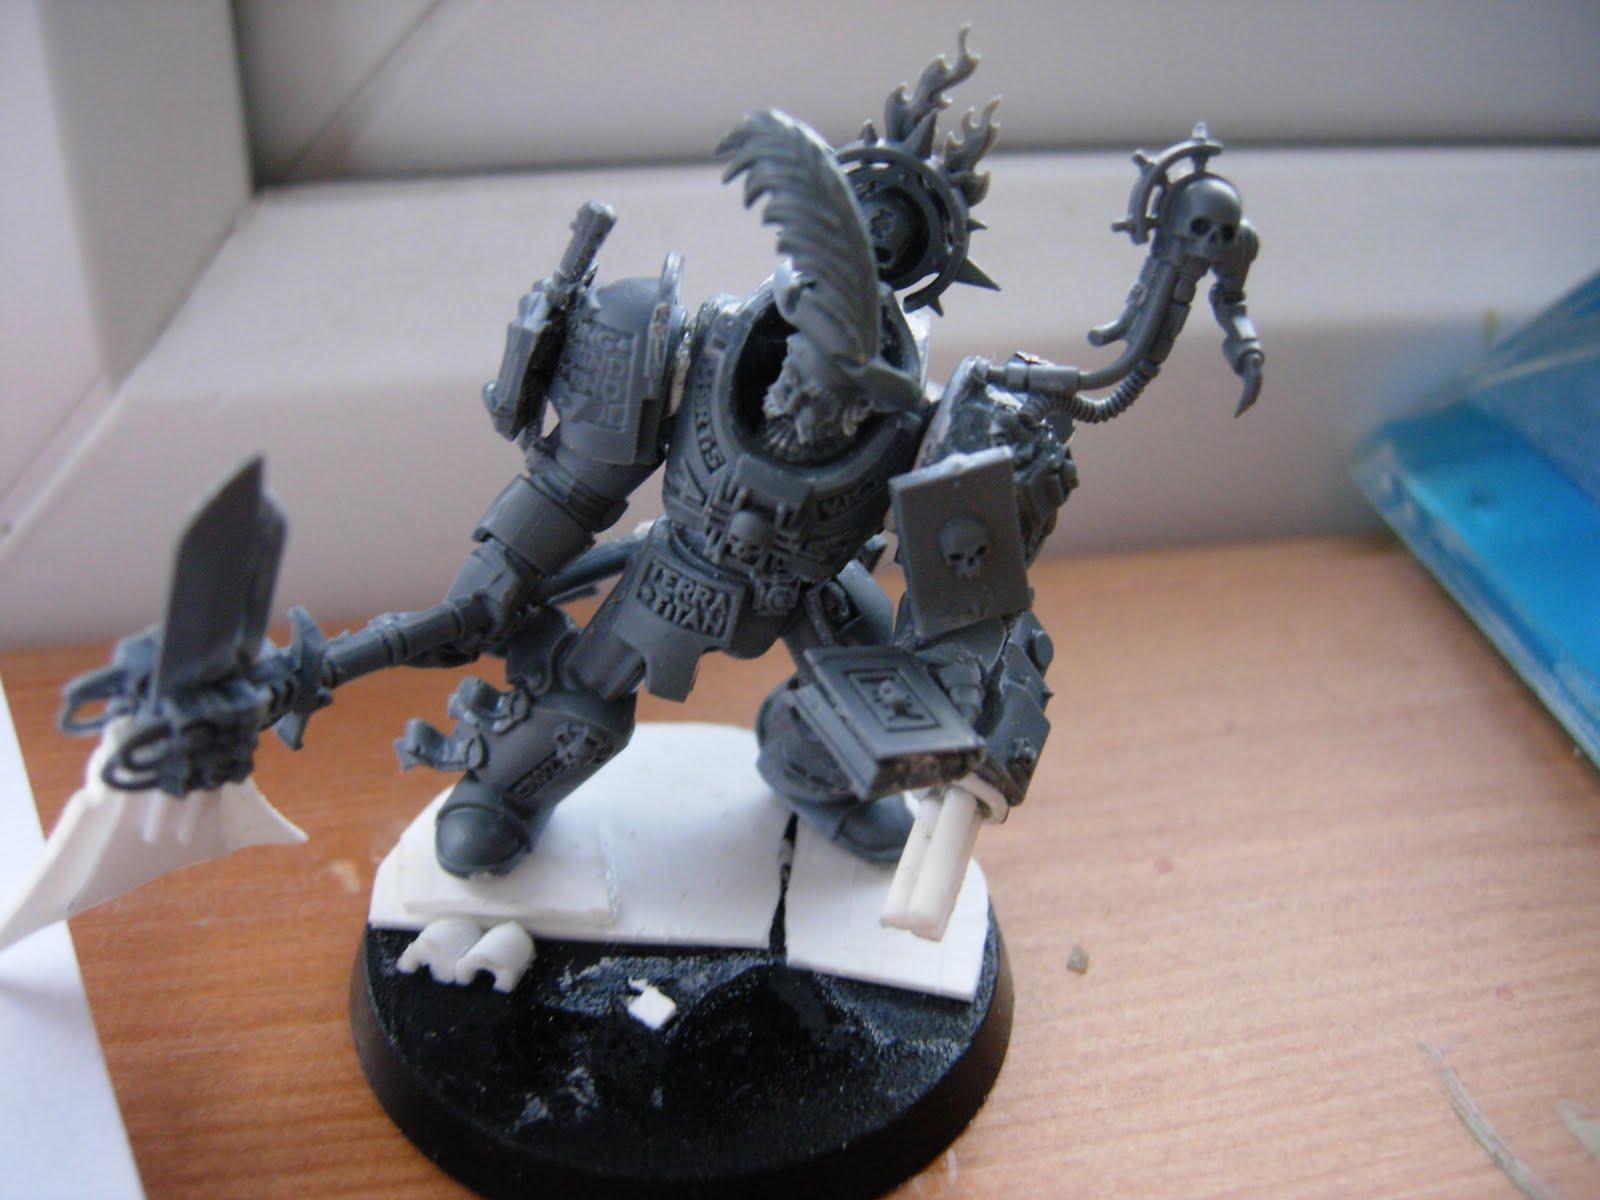 Fuzzbukets Mini Mayhem My Fave Conversion Grey Knights Librarian